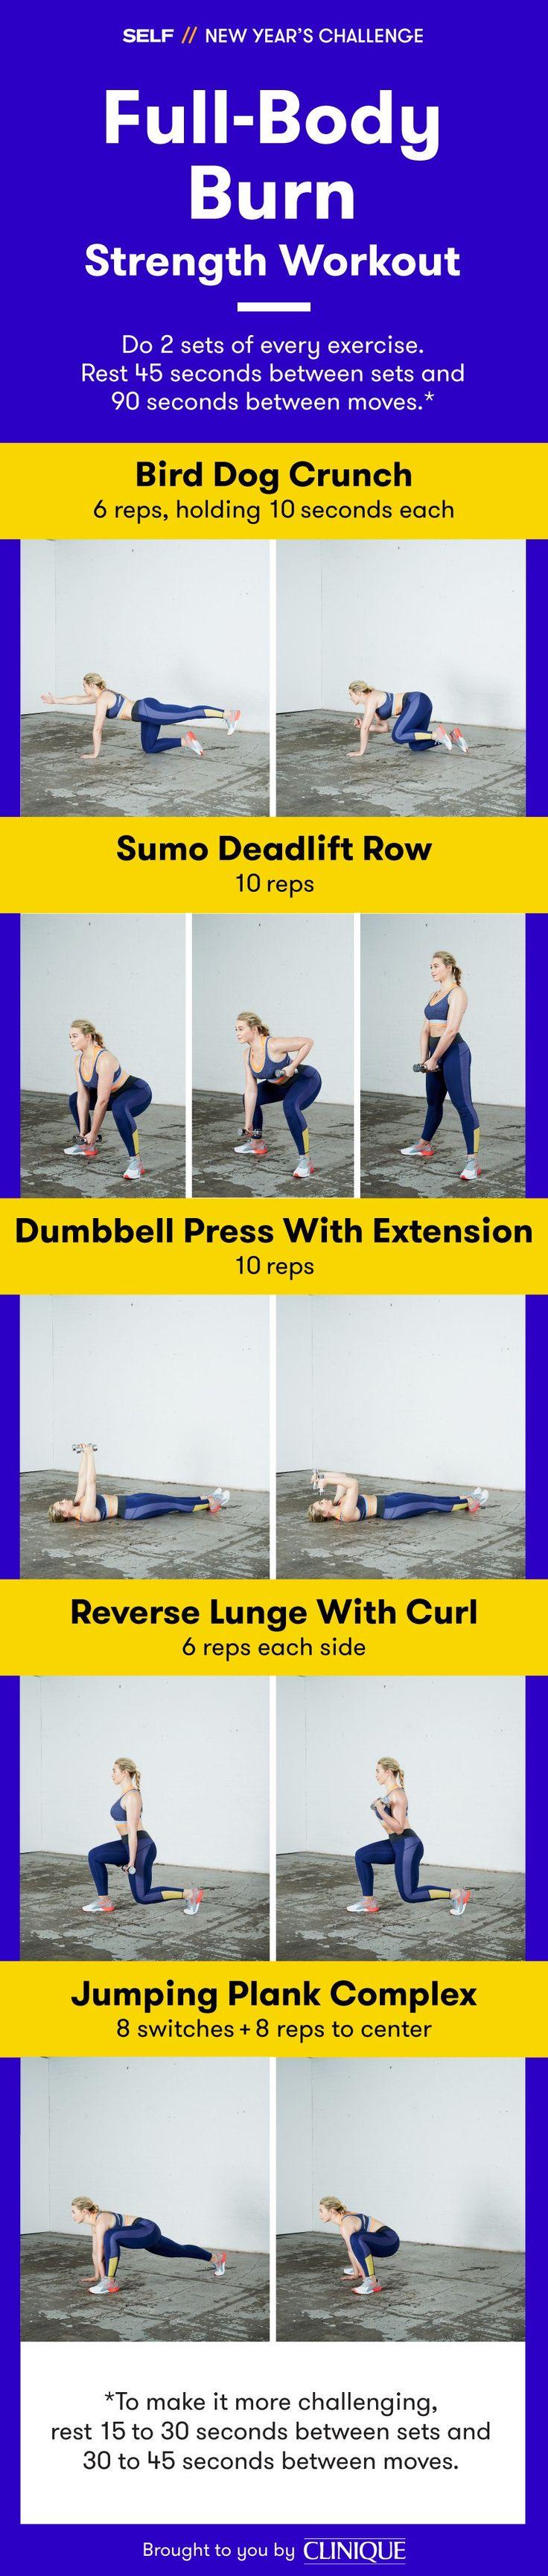 SEL New Year's Challenge - Full-Body Burn Strength Workout #TeamSELF #NewYearsChallenge